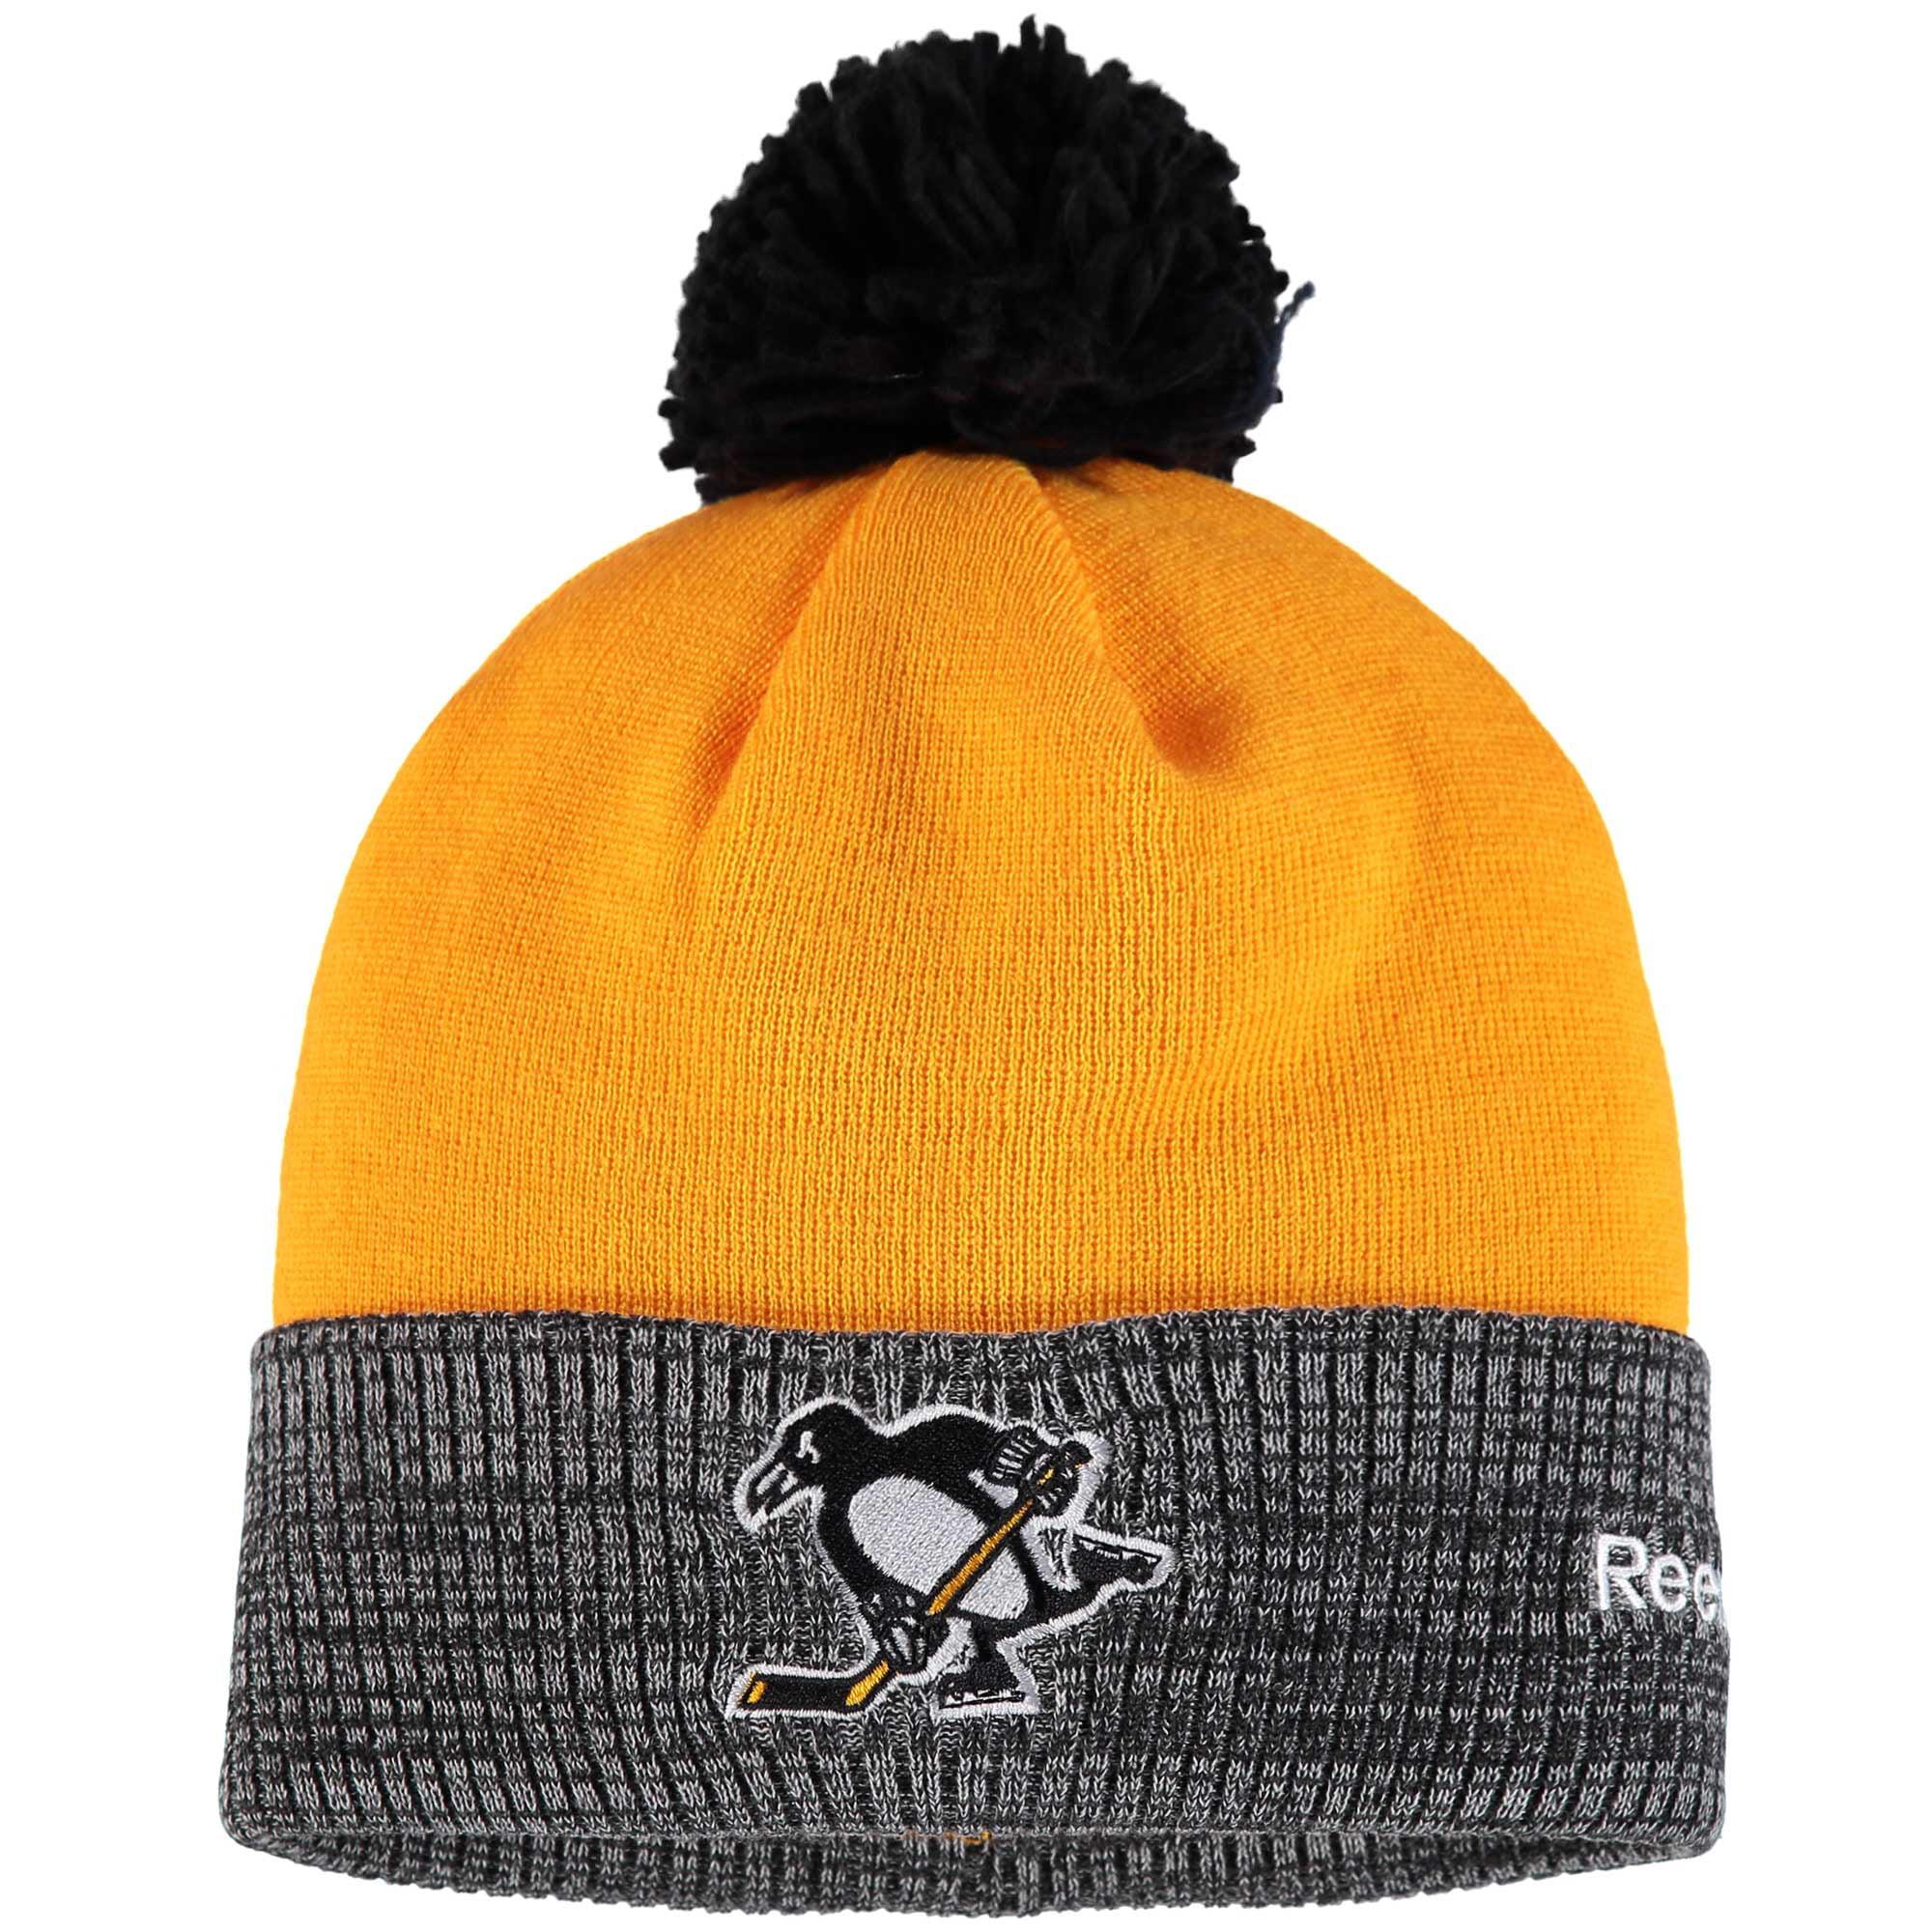 Pittsburgh Penguins Reebok 2017 Stadium Series Goalie Cuffed Knit Hat With Pom Yellow Heather Gray OSFA by REEBOK/SLD/ADIDAS INDY